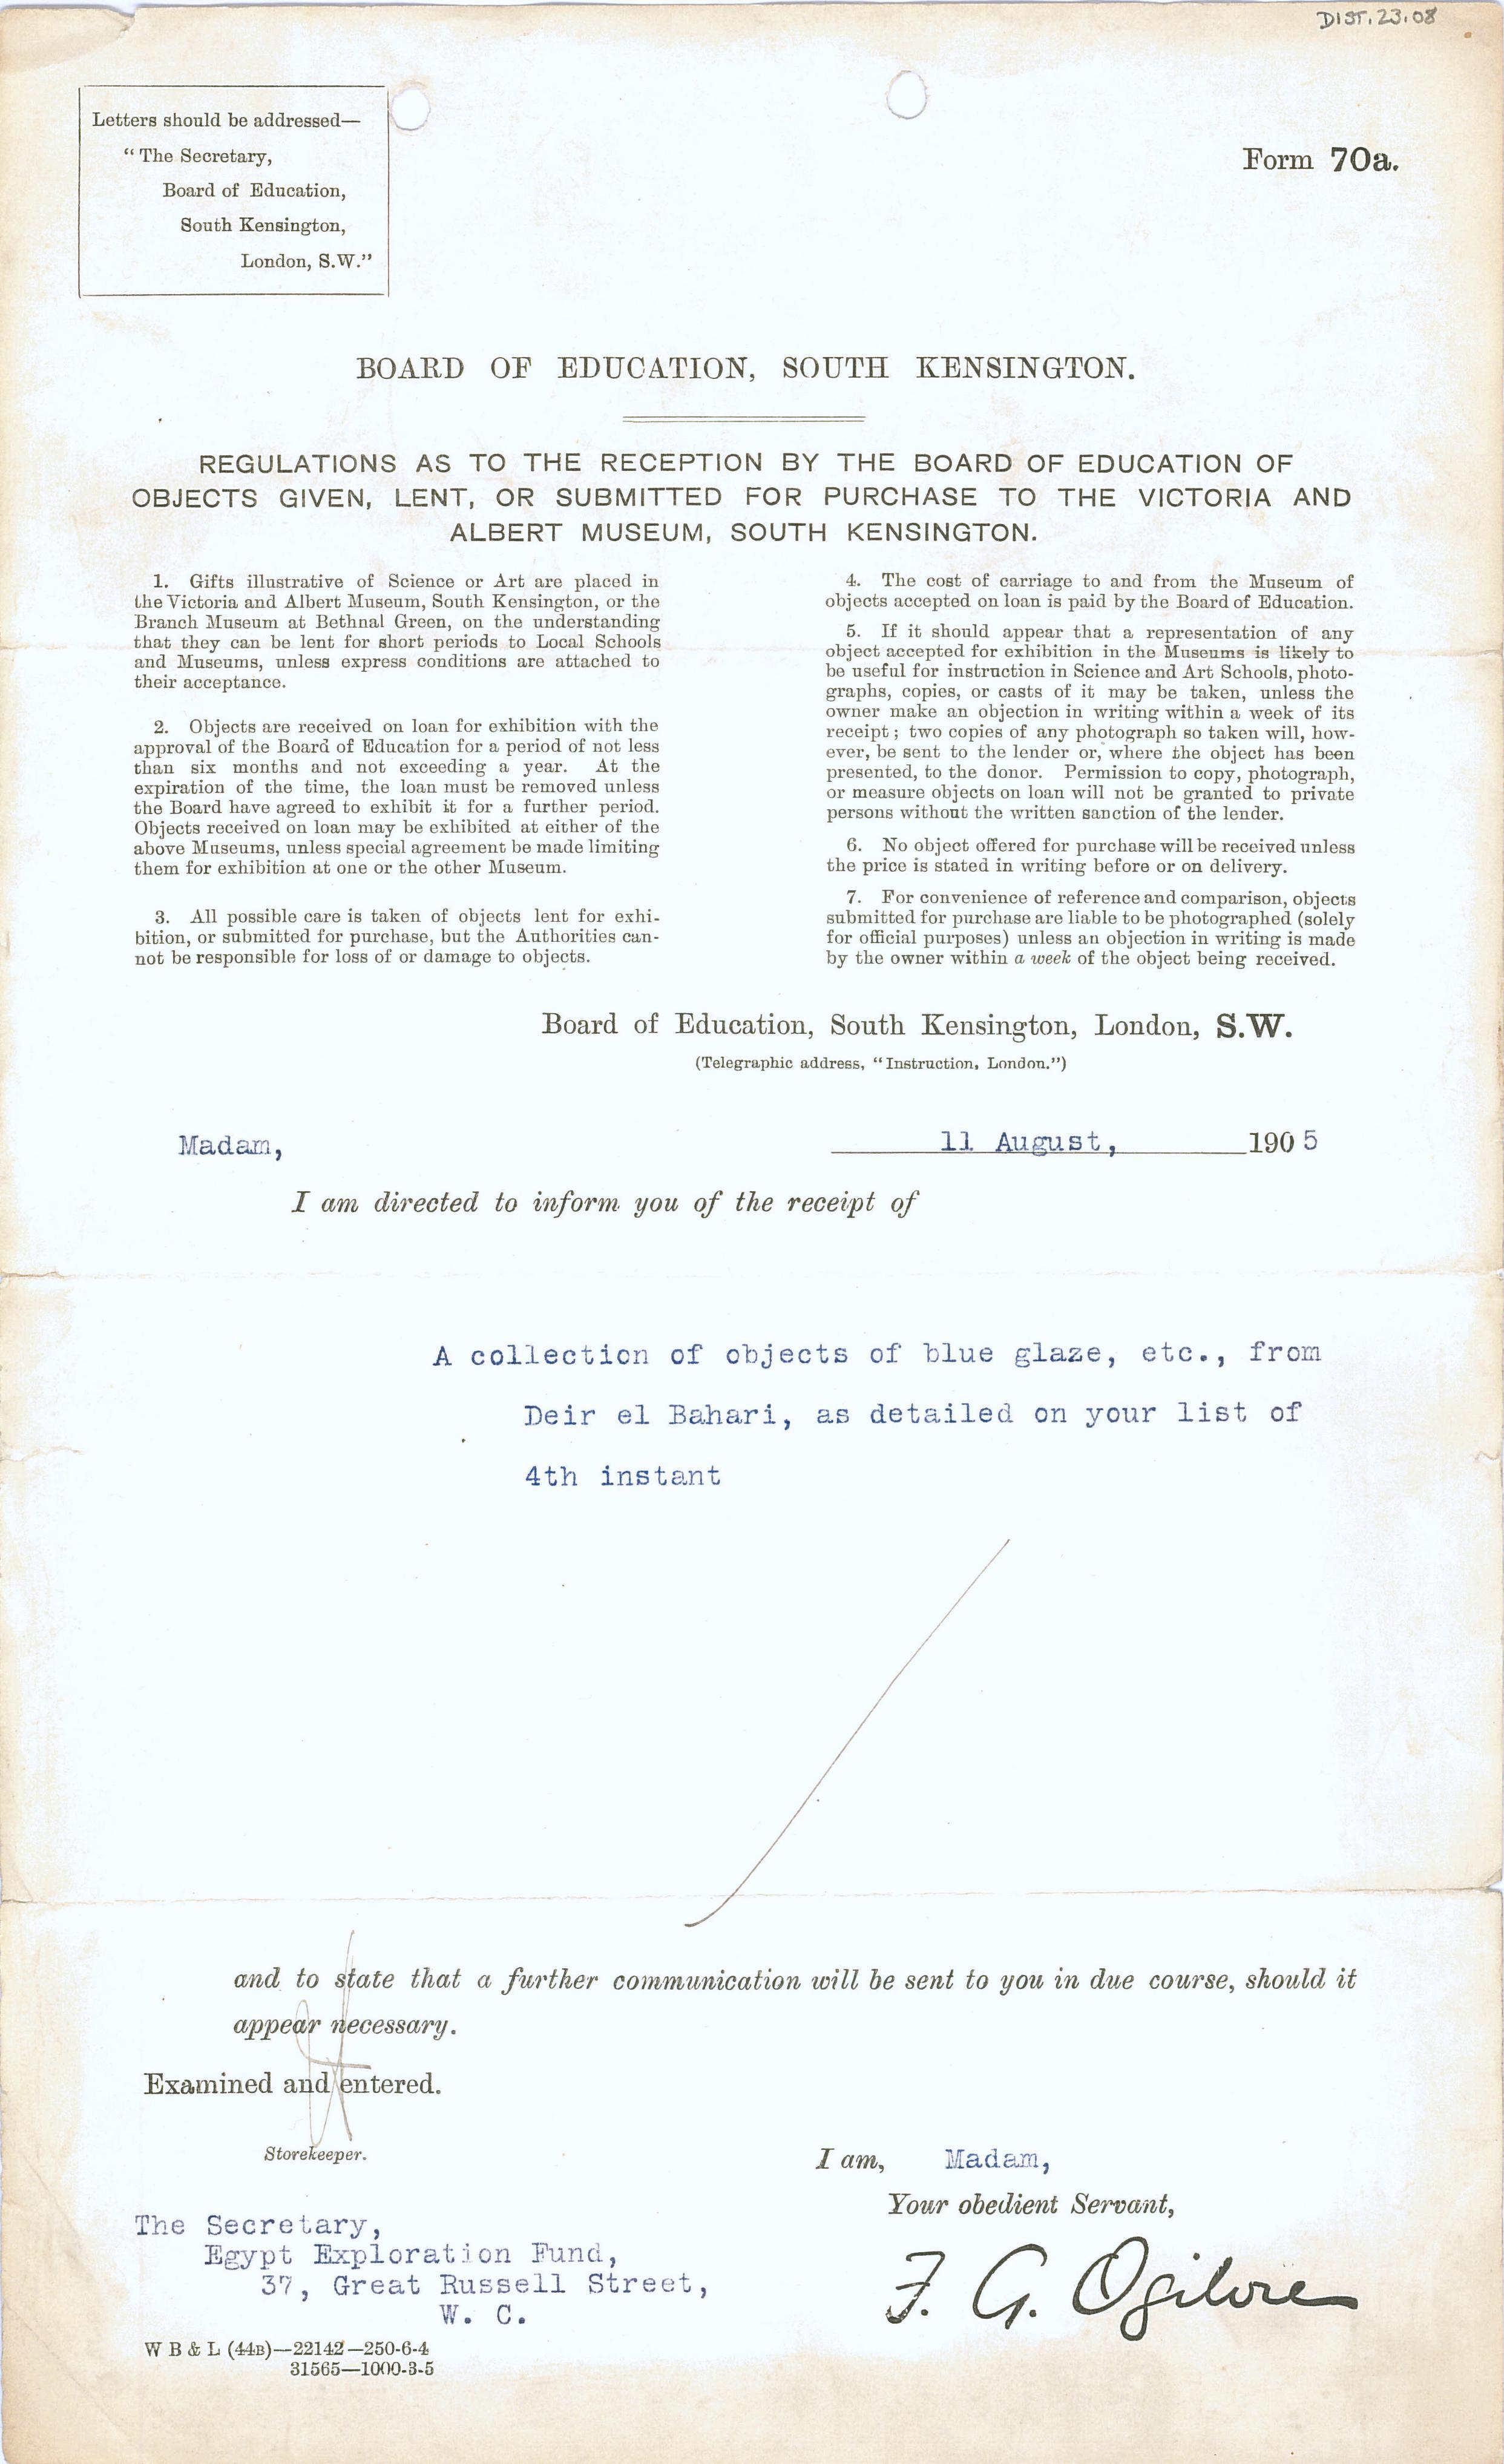 1904-05 Sinai, Deir el-Bahri, Oxyrhynchus, Naukratis DIST.23.08